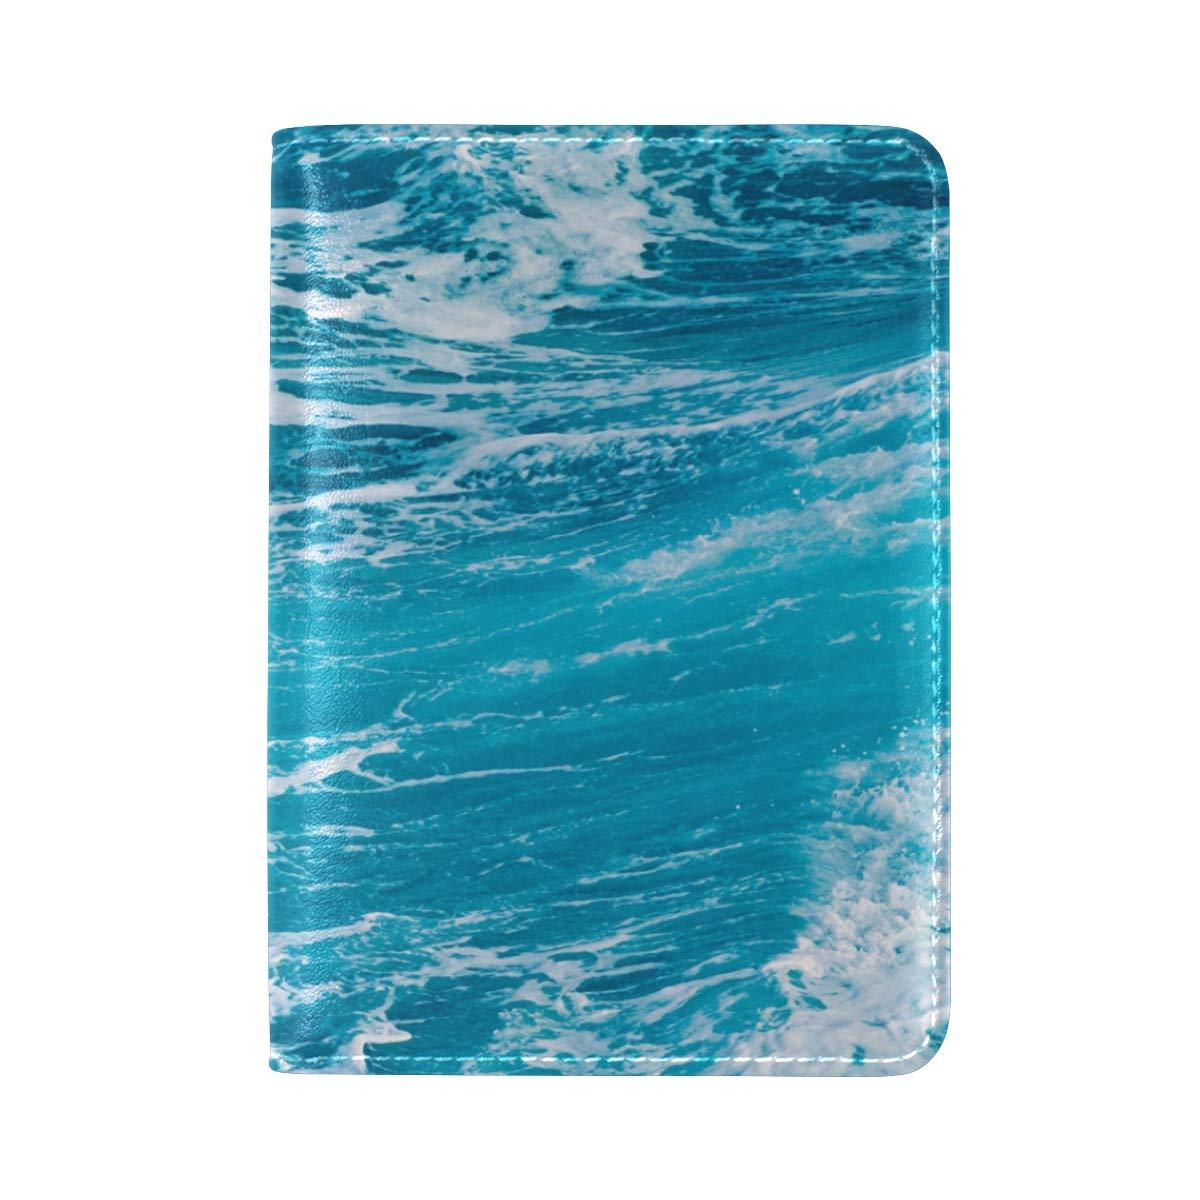 White Blue Ocean Waves Water One Pocket Leather Passport Holder Cover Case Protector for Men Women Travel